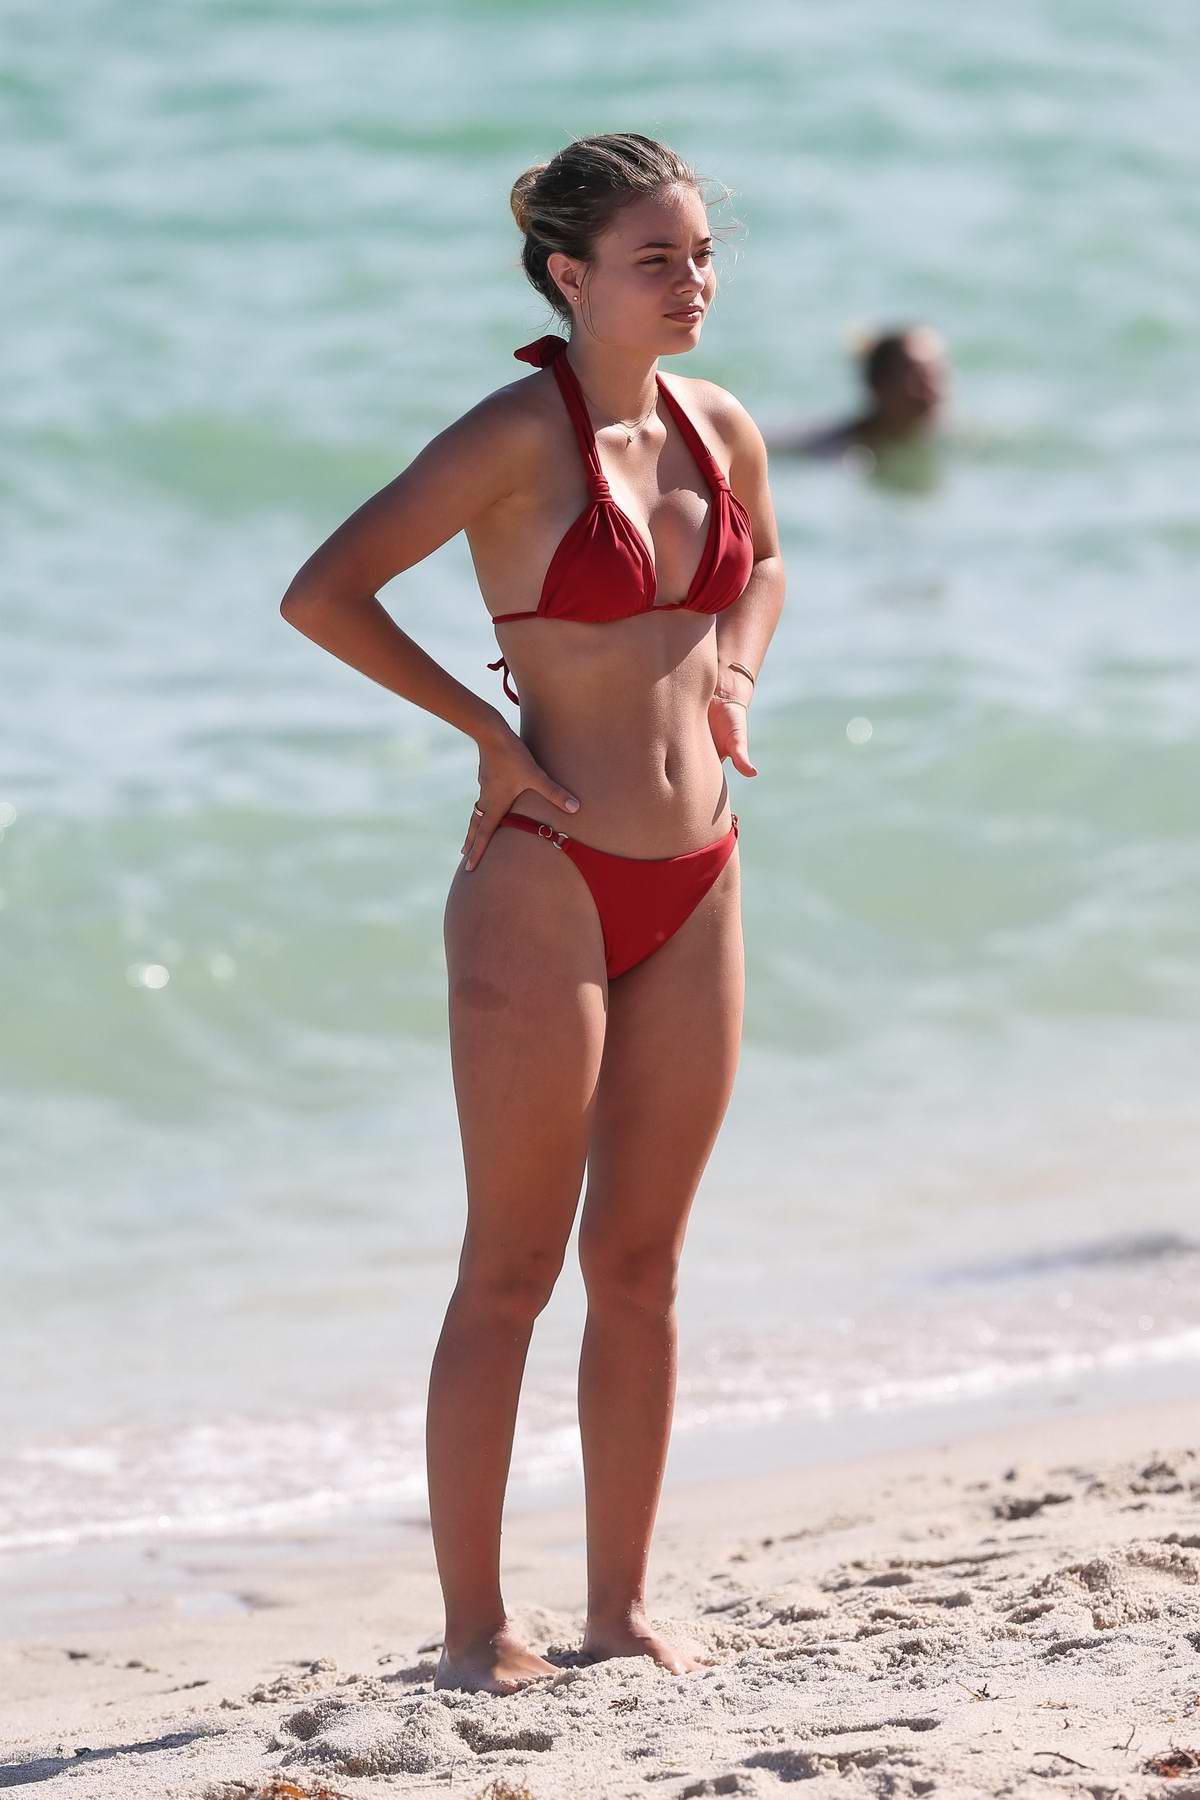 Celebrity Mariya Melnyk nudes (63 foto and video), Topless, Hot, Boobs, braless 2019